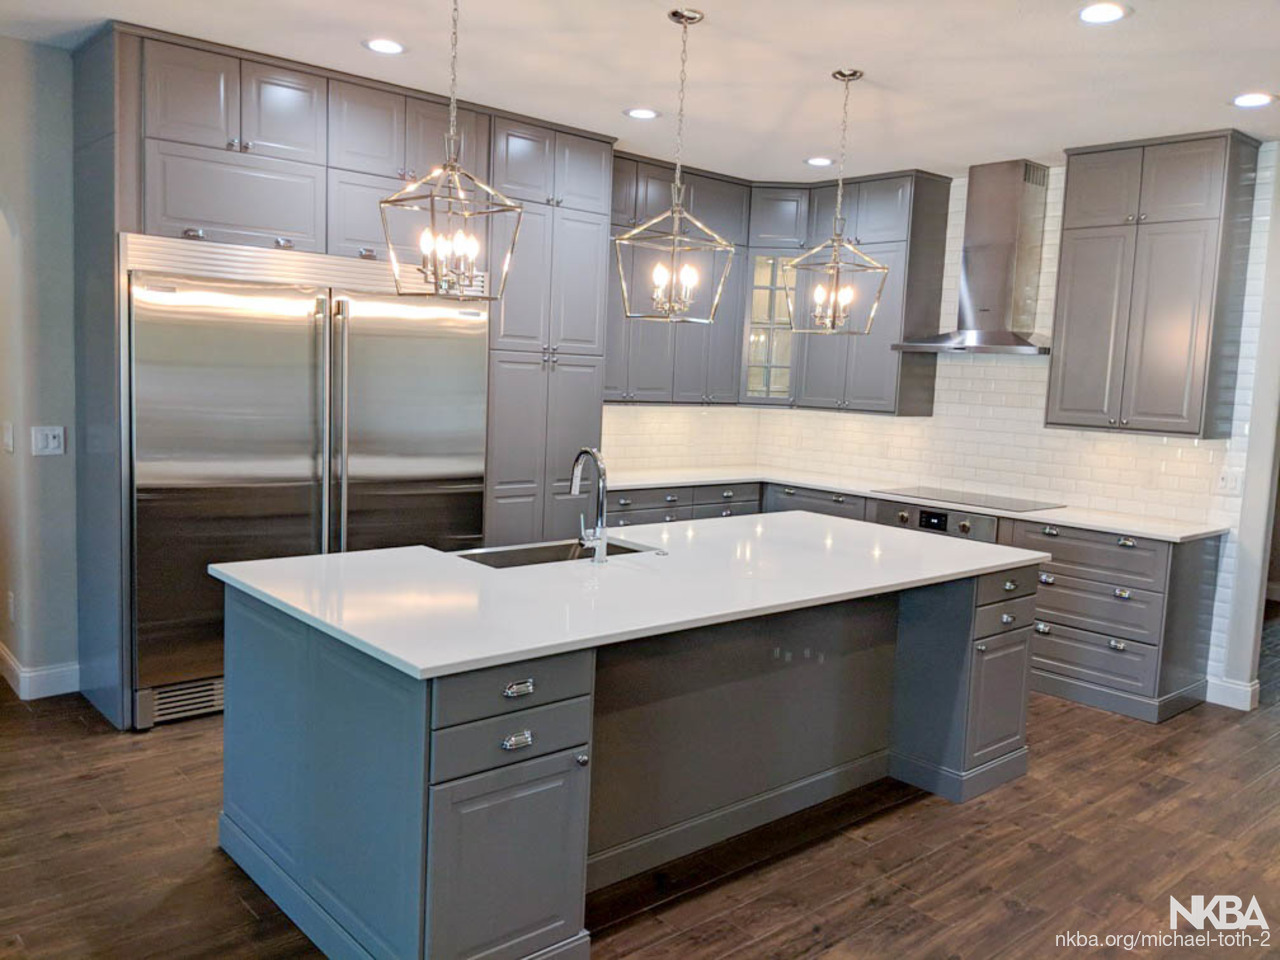 Ikea Kitchen With Bobdyn Gray Doors In Orlando Nkba